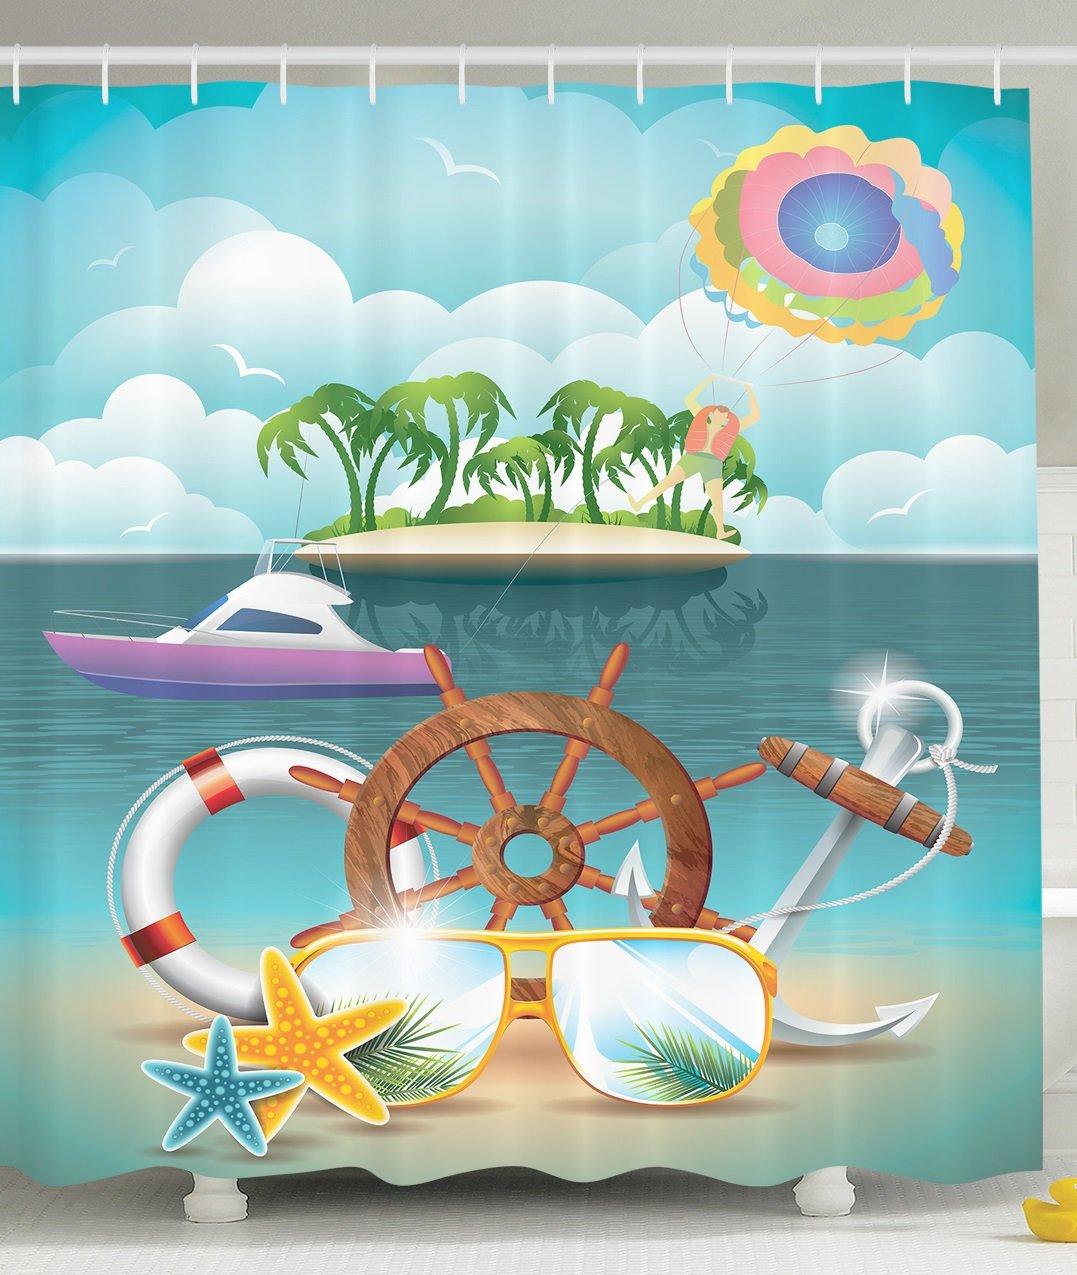 Sandy Beach clipart island Nautical Vacation  Summer Tropical